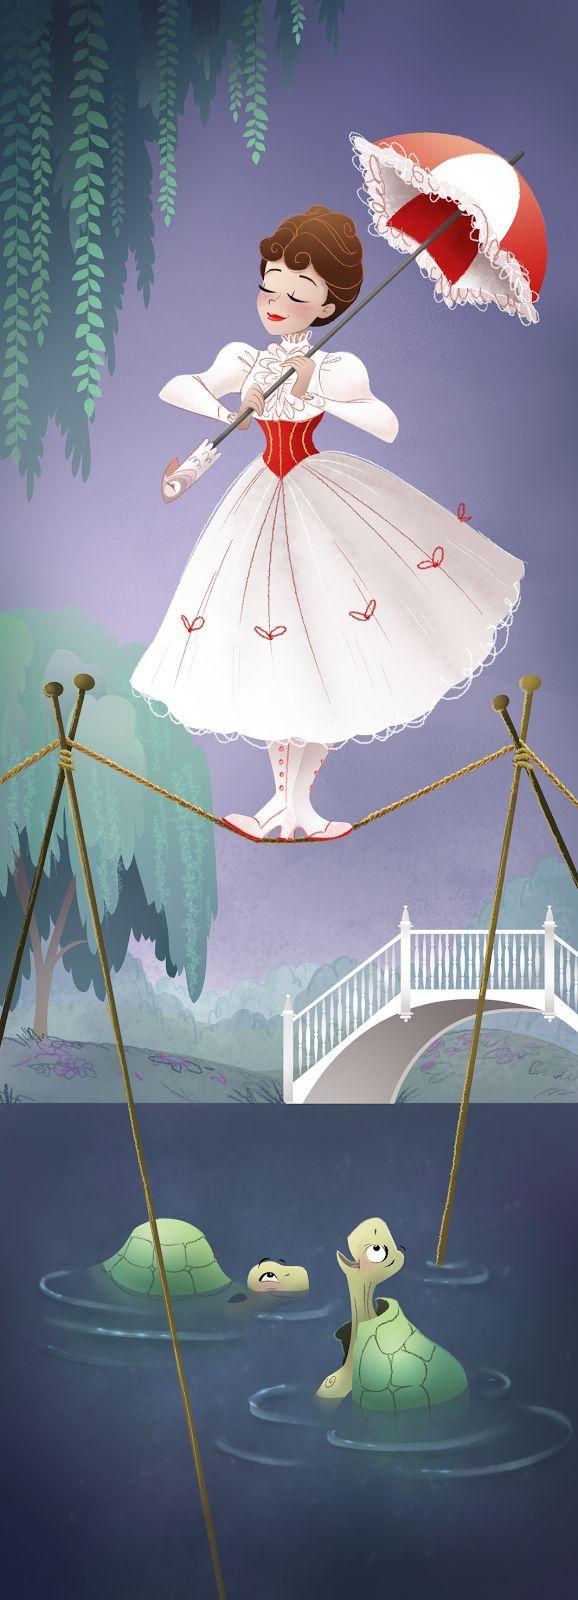 Haunted Mansion Mary Poppins - Disney